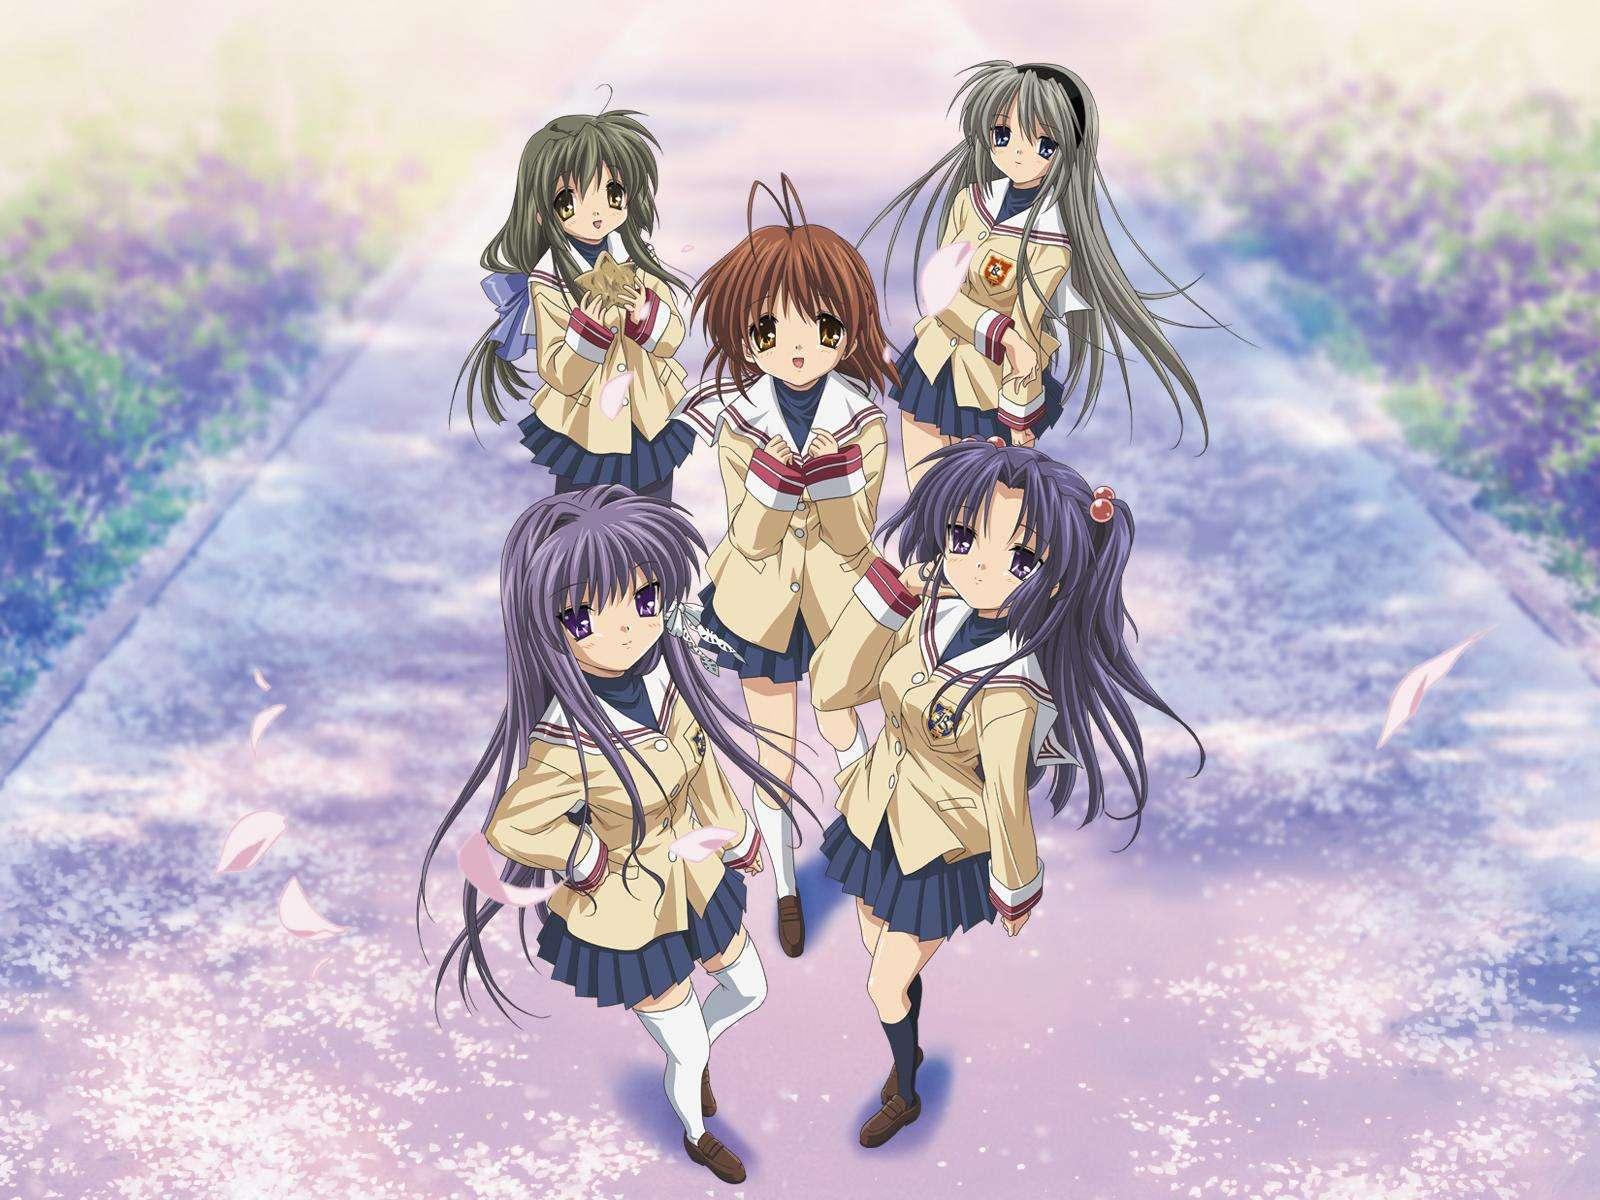 http://blog-imgs-43.fc2.com/a/n/k/ankosokuho/clannad66.jpg